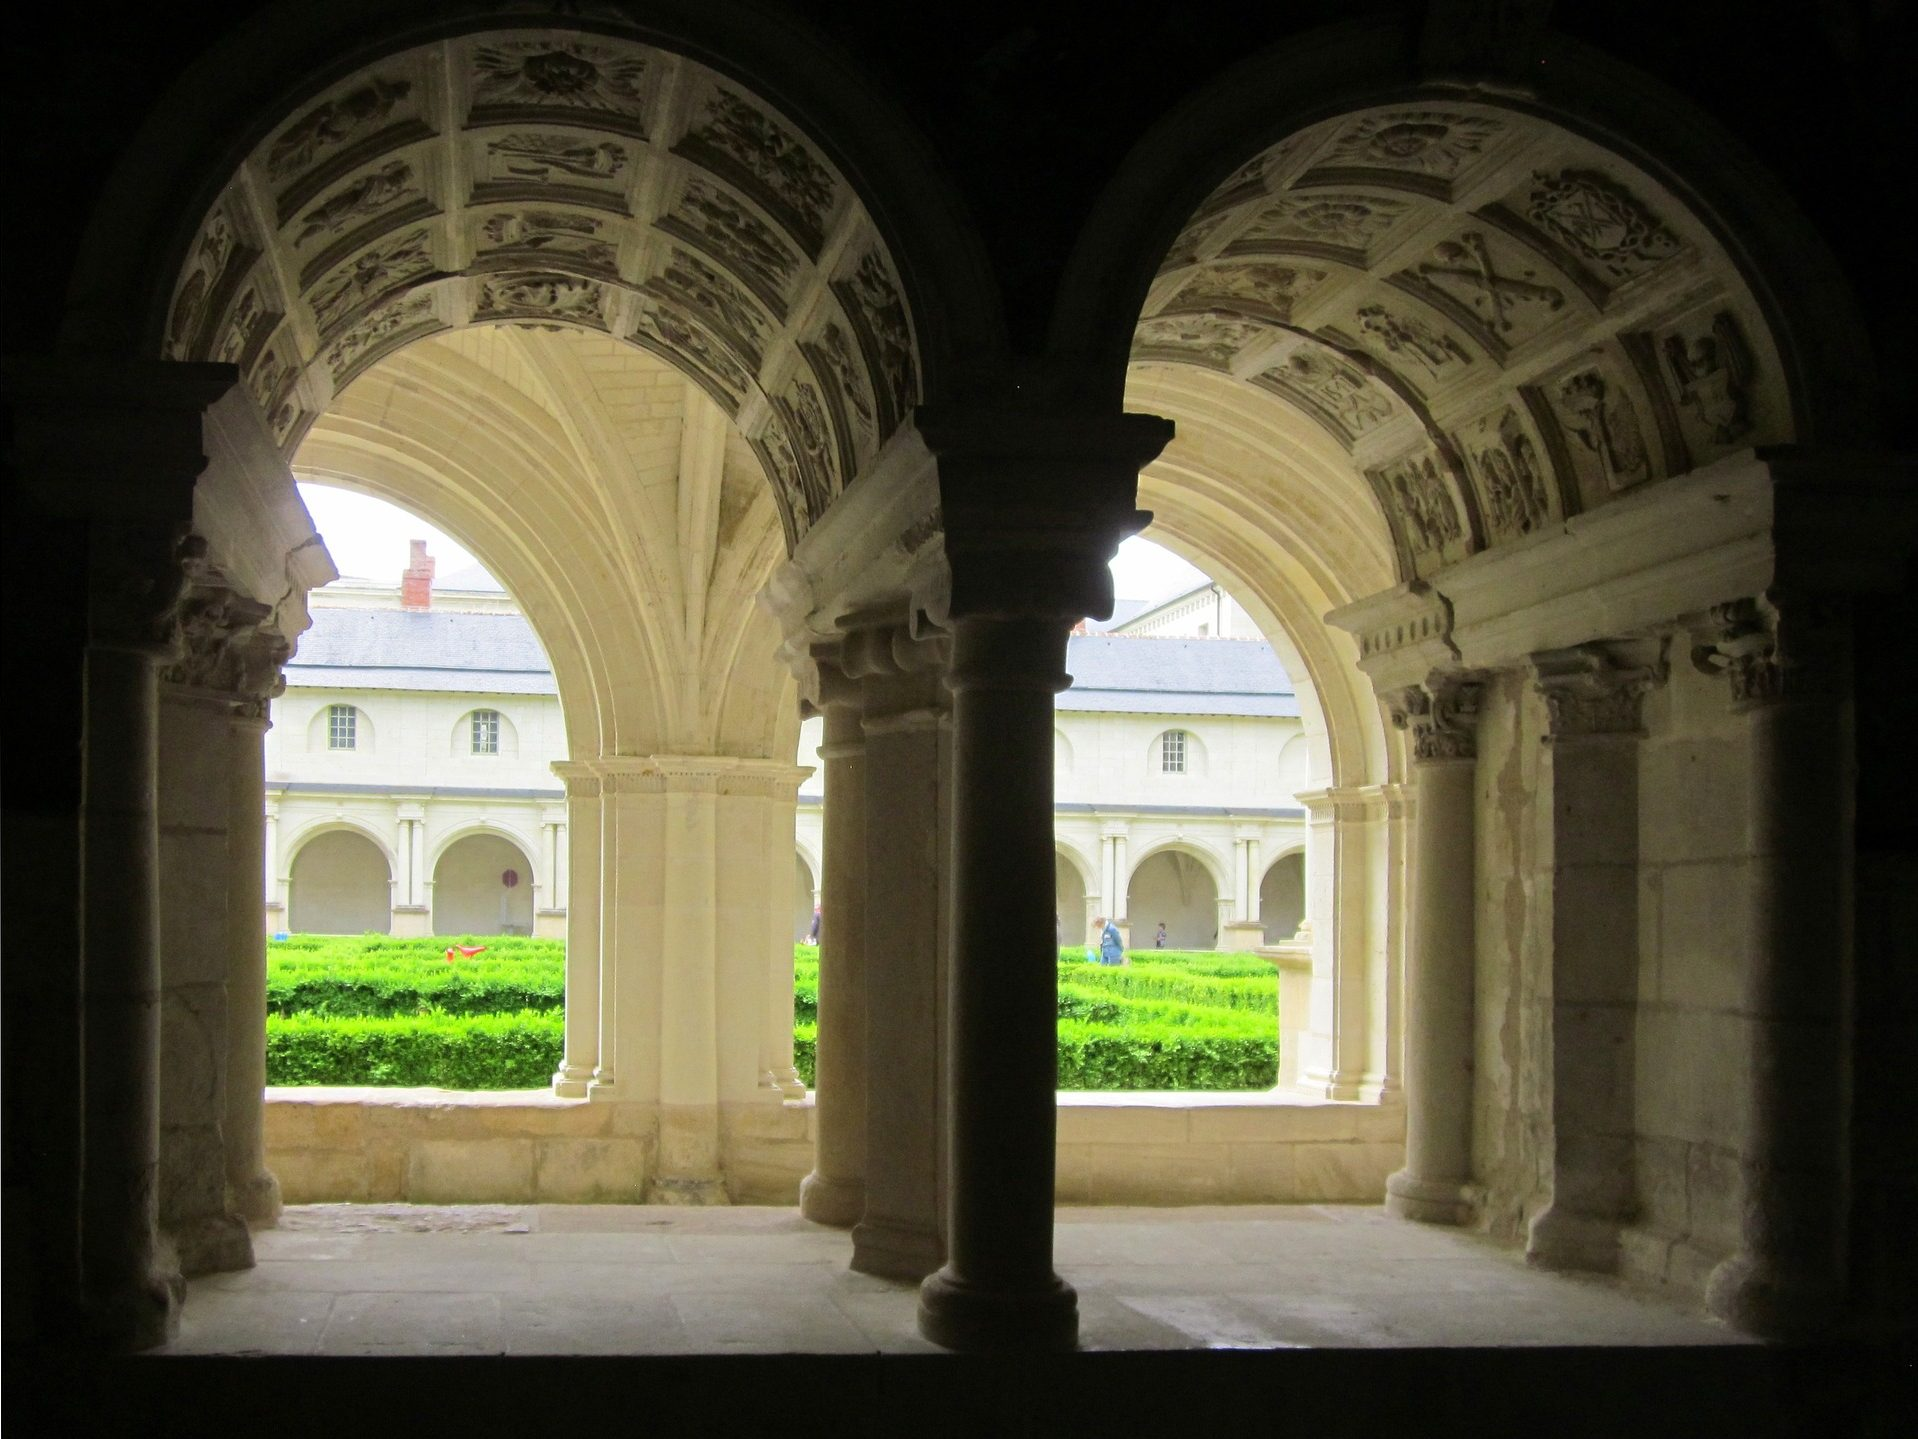 Cloitre jardin sculpture abbaye royal fontevraud tourisme